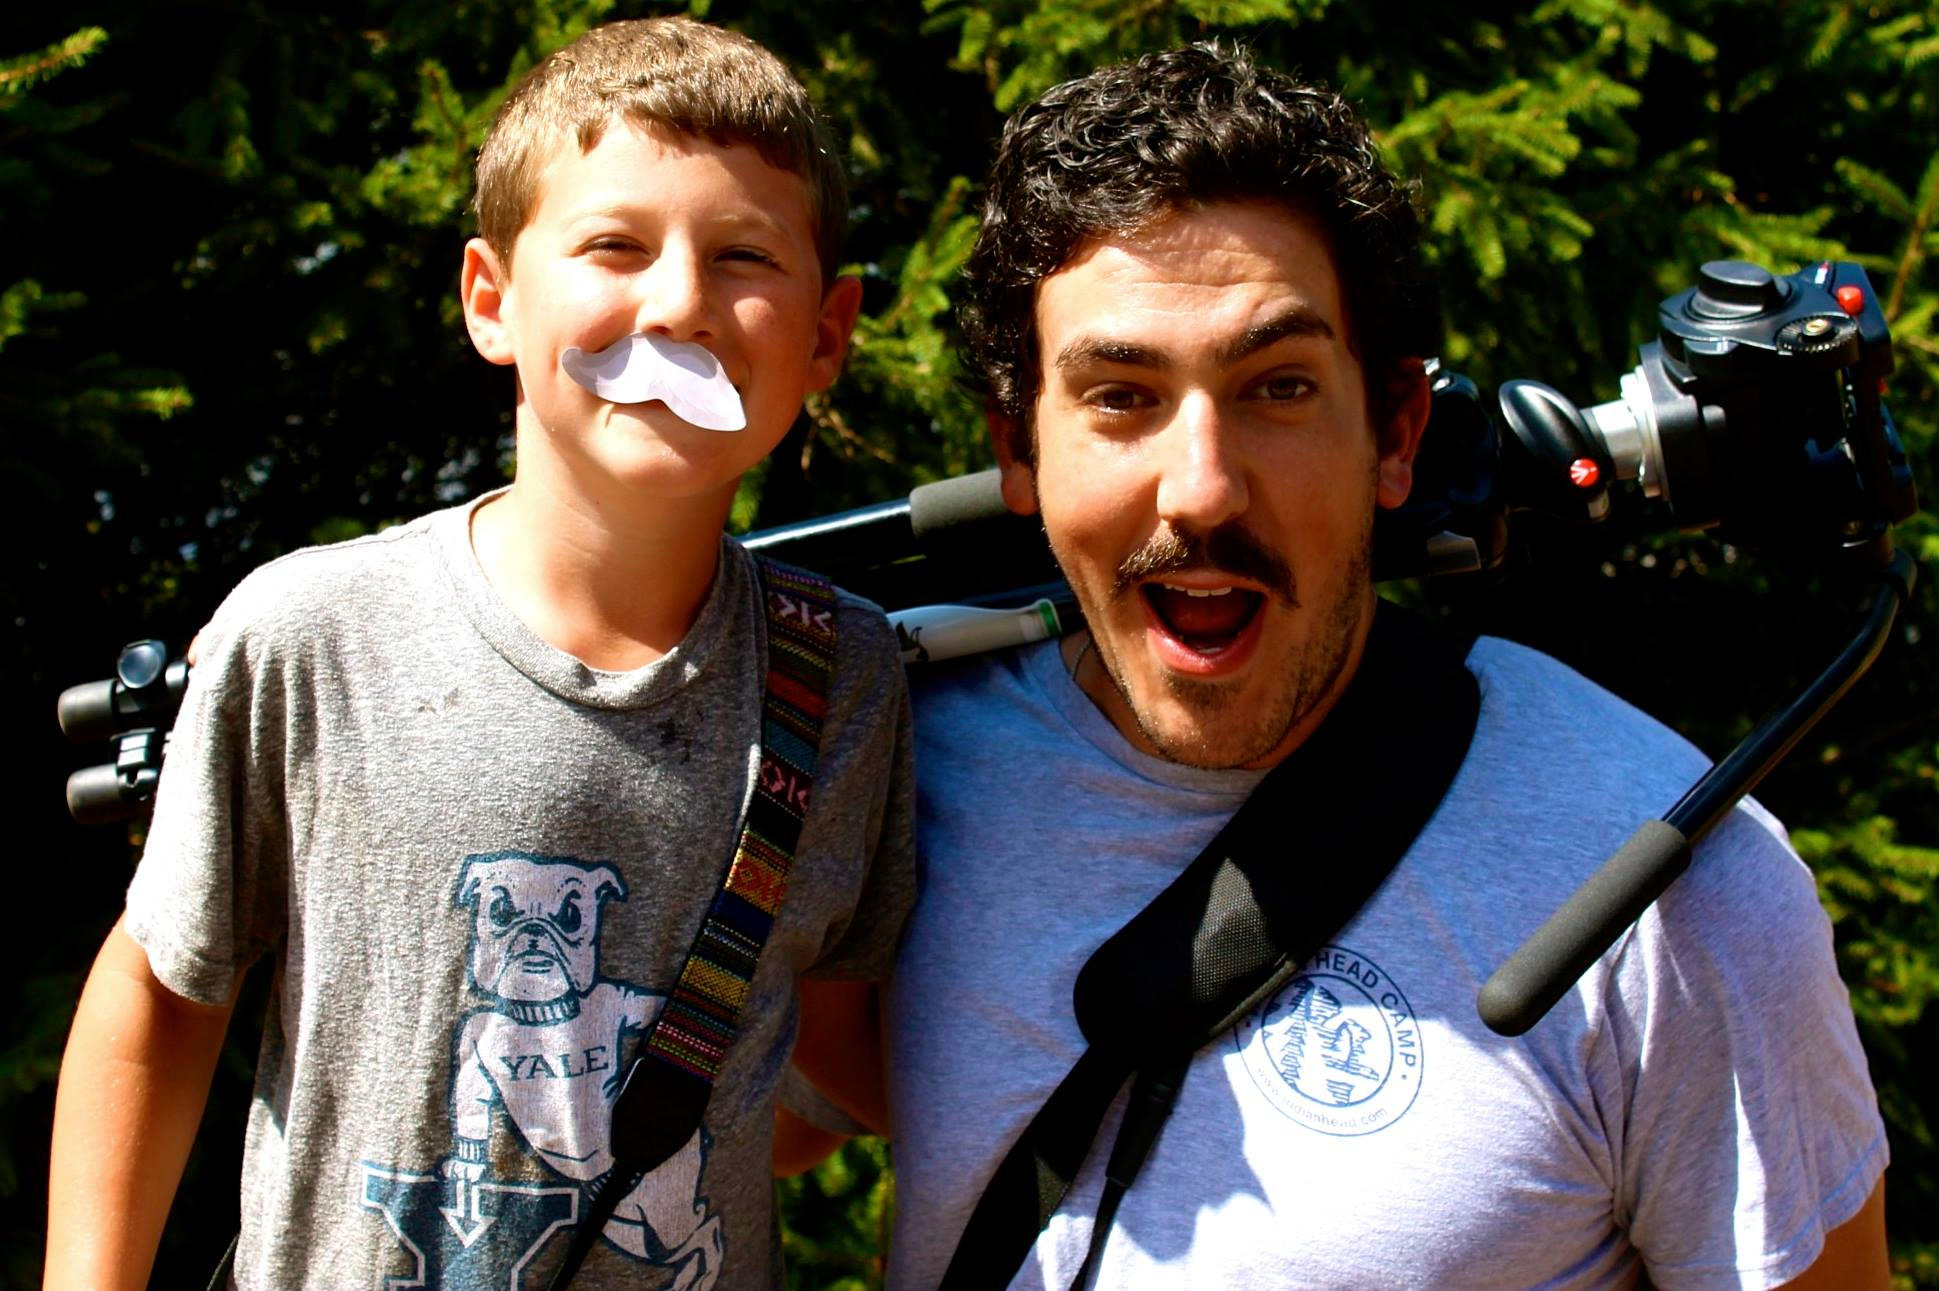 Josh the Moo Crew intern and Director Dan Zelikman